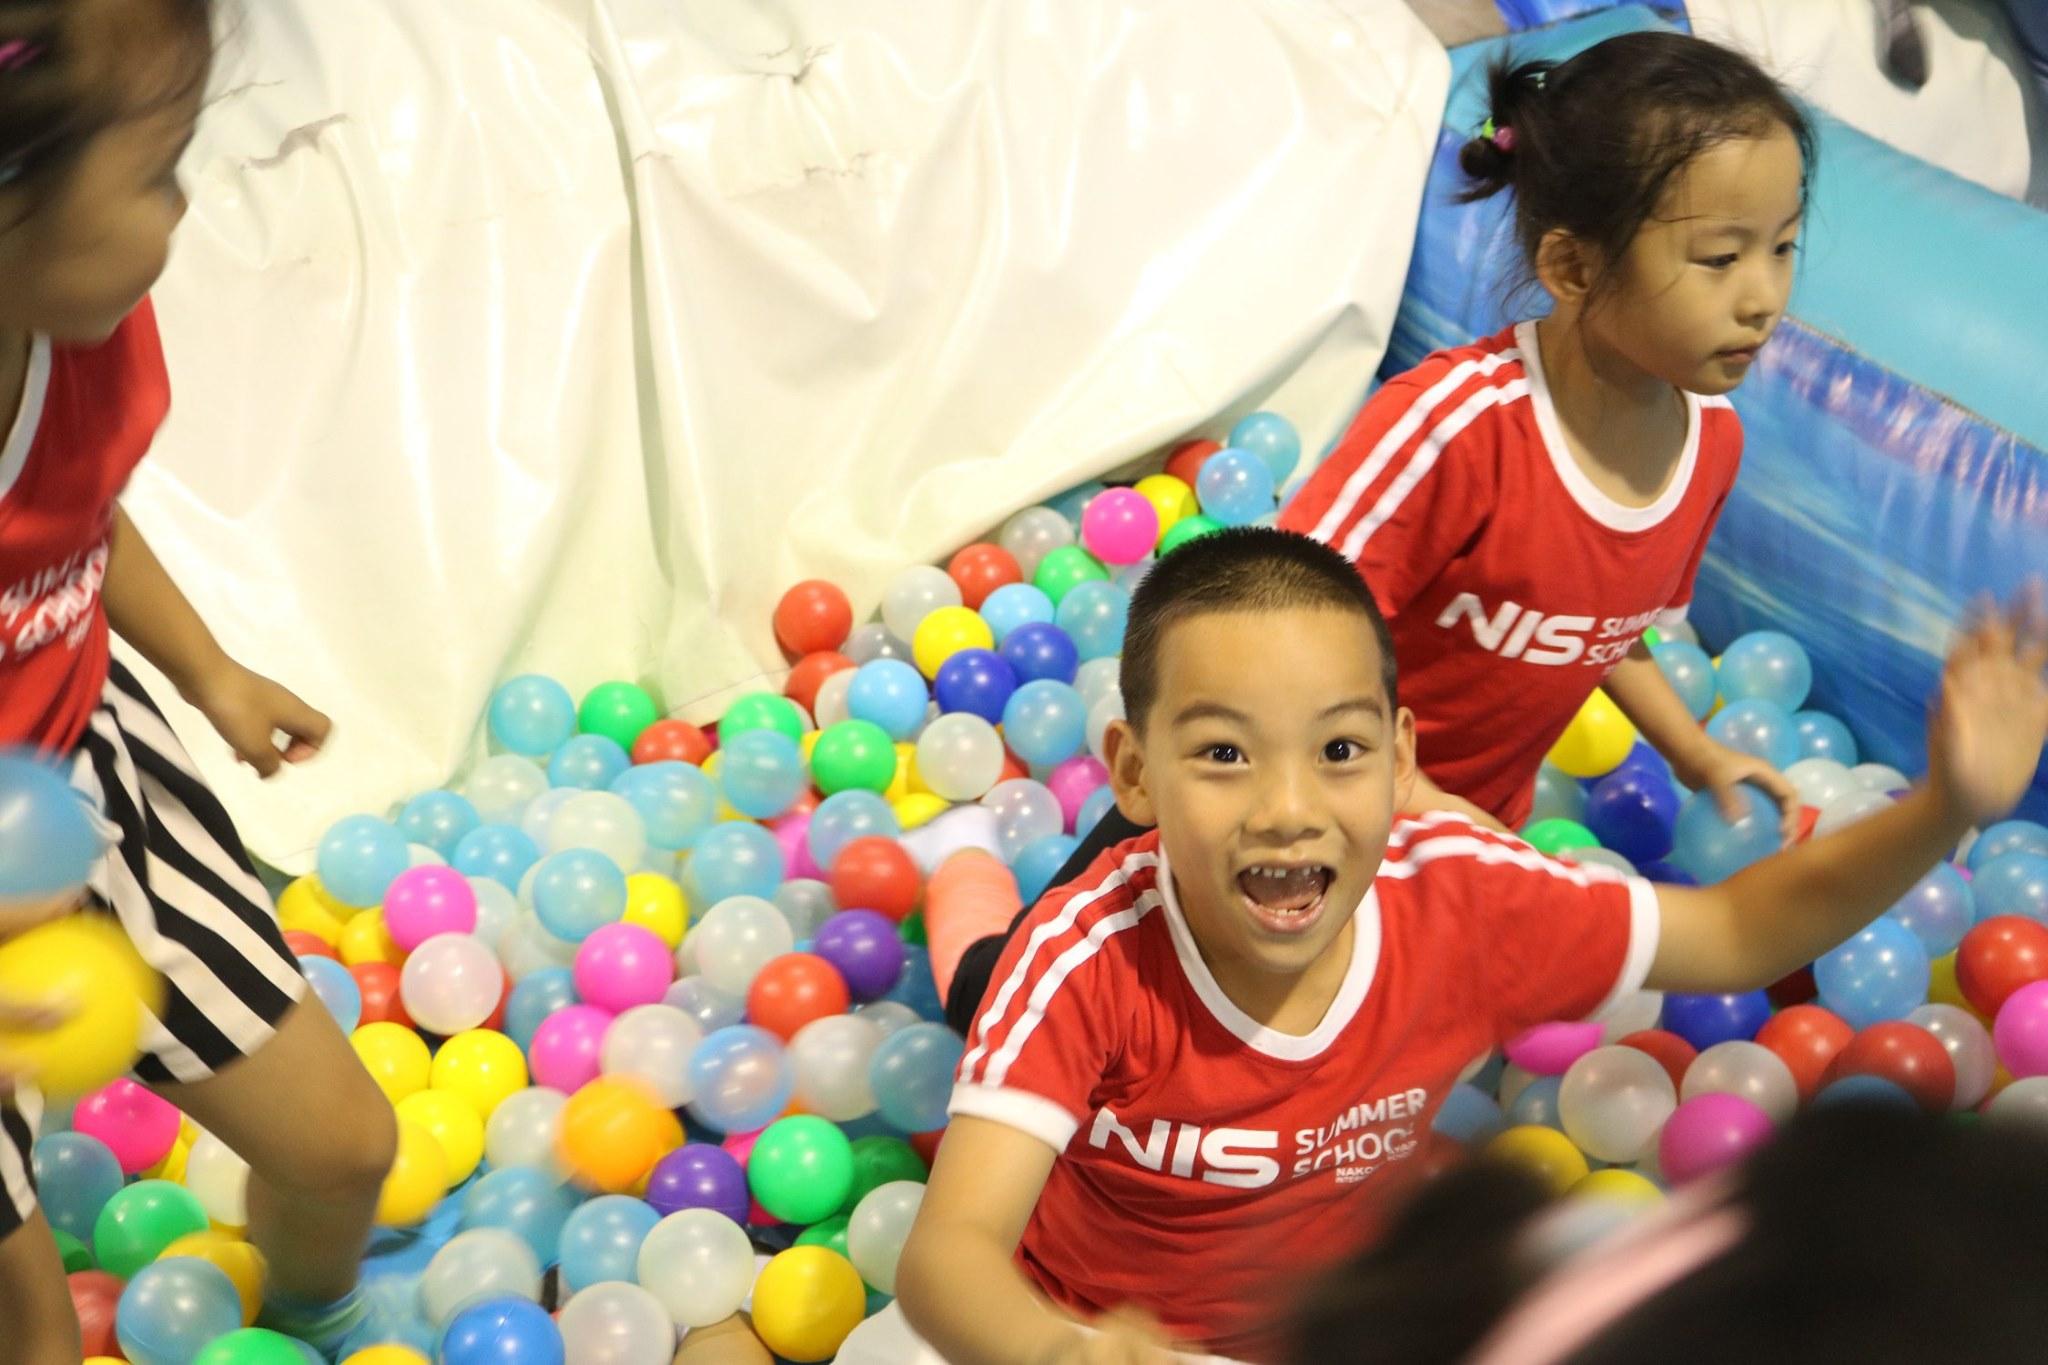 NIS-Summer-School-2019-Day-24-Kiddy-Land-163